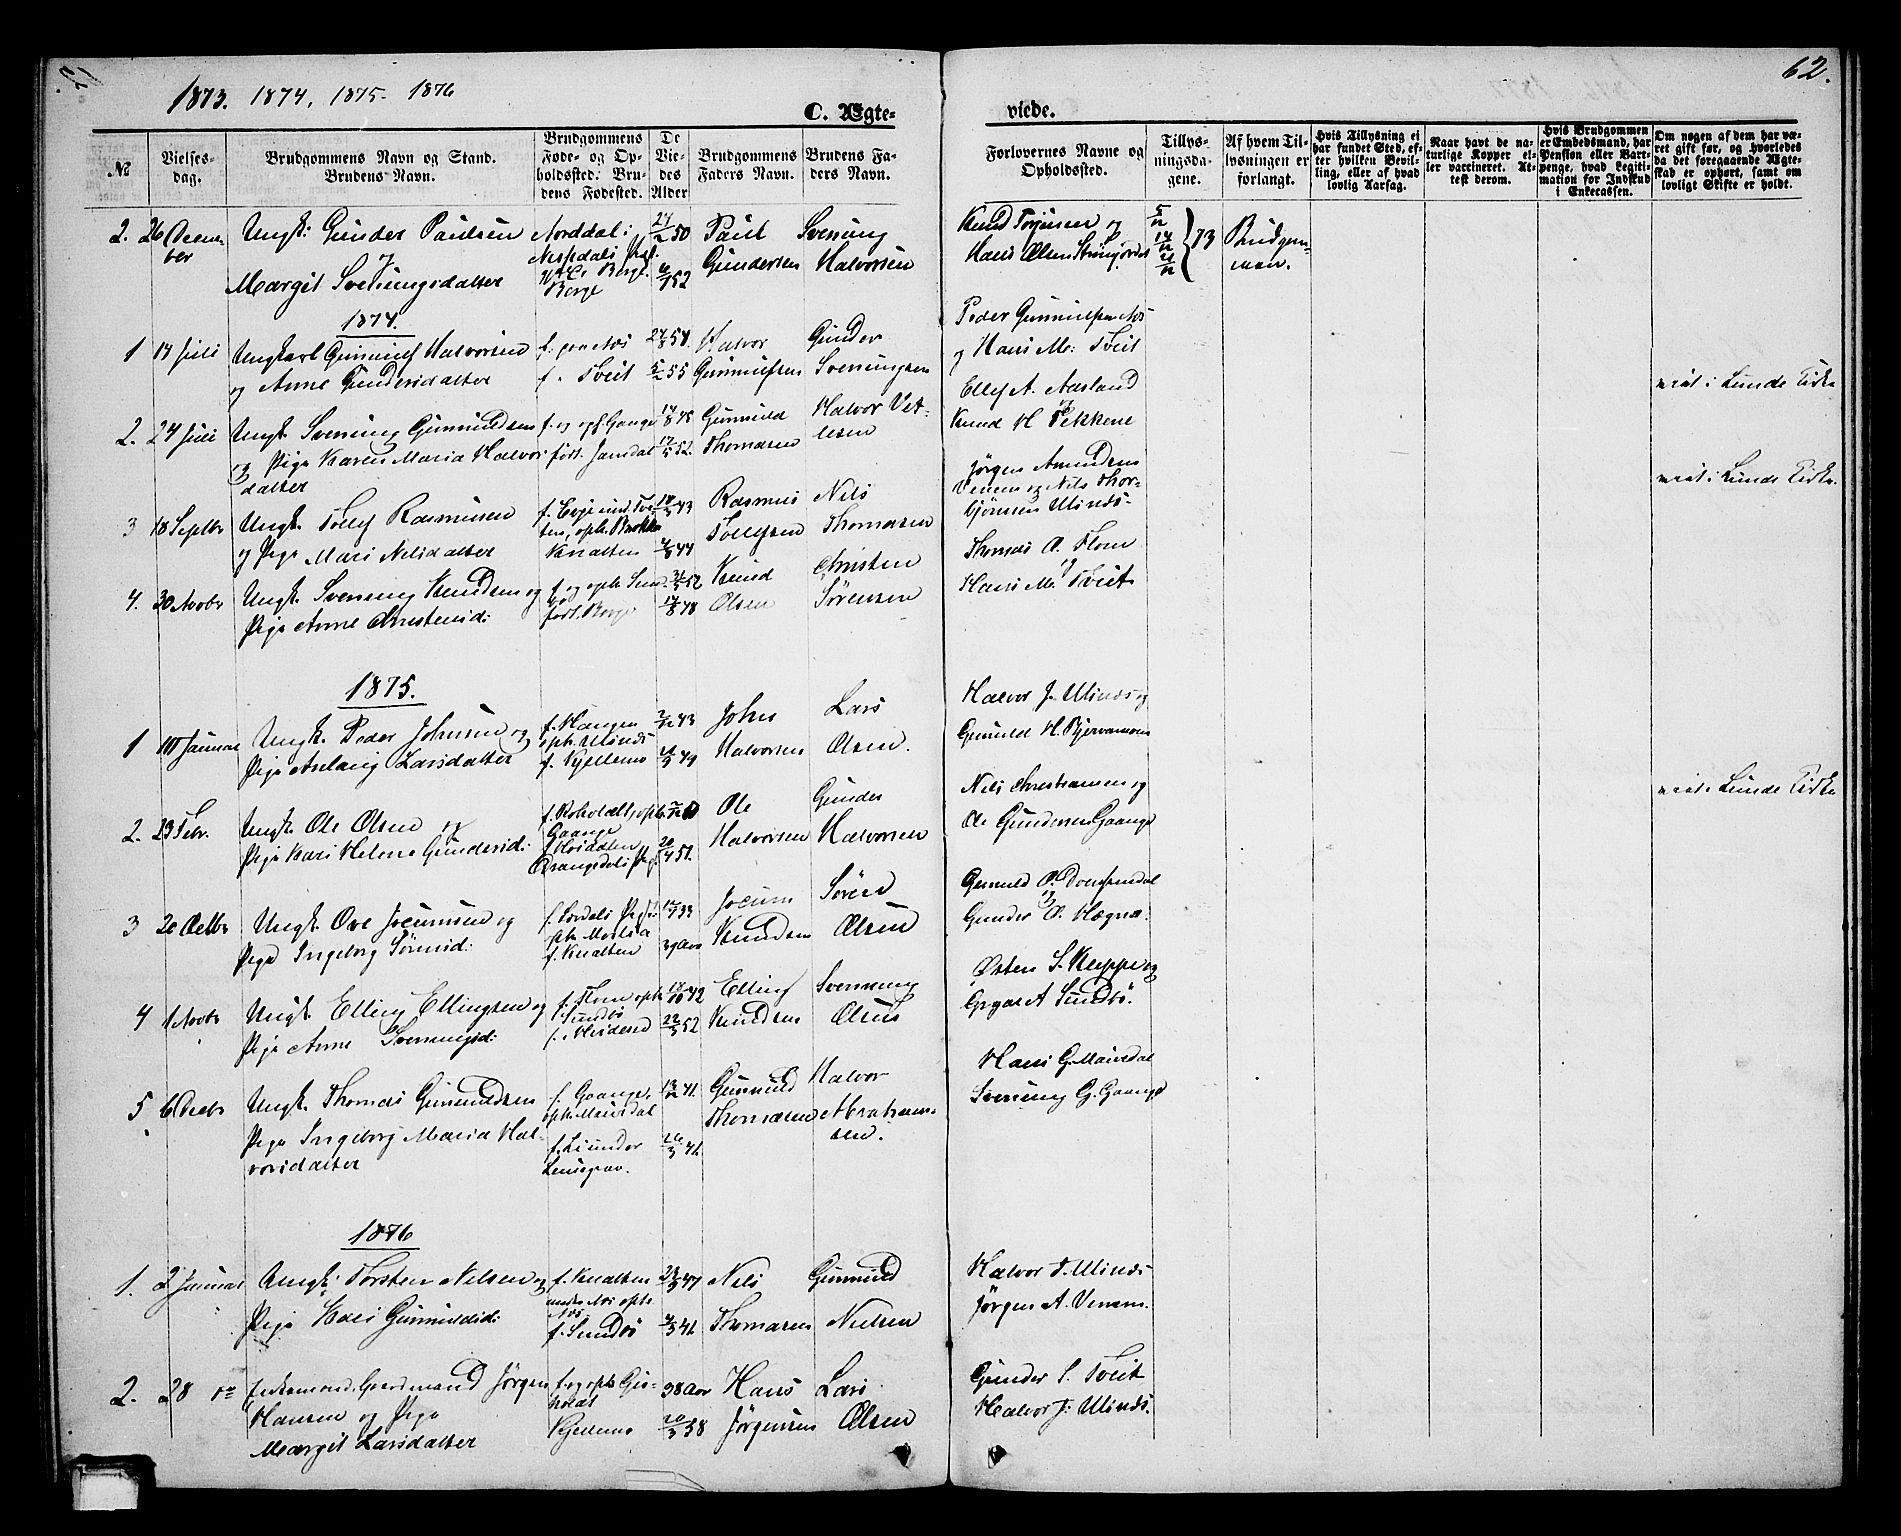 SAKO, Lunde kirkebøker, G/Gb/L0001: Klokkerbok nr. II 1, 1866-1887, s. 62